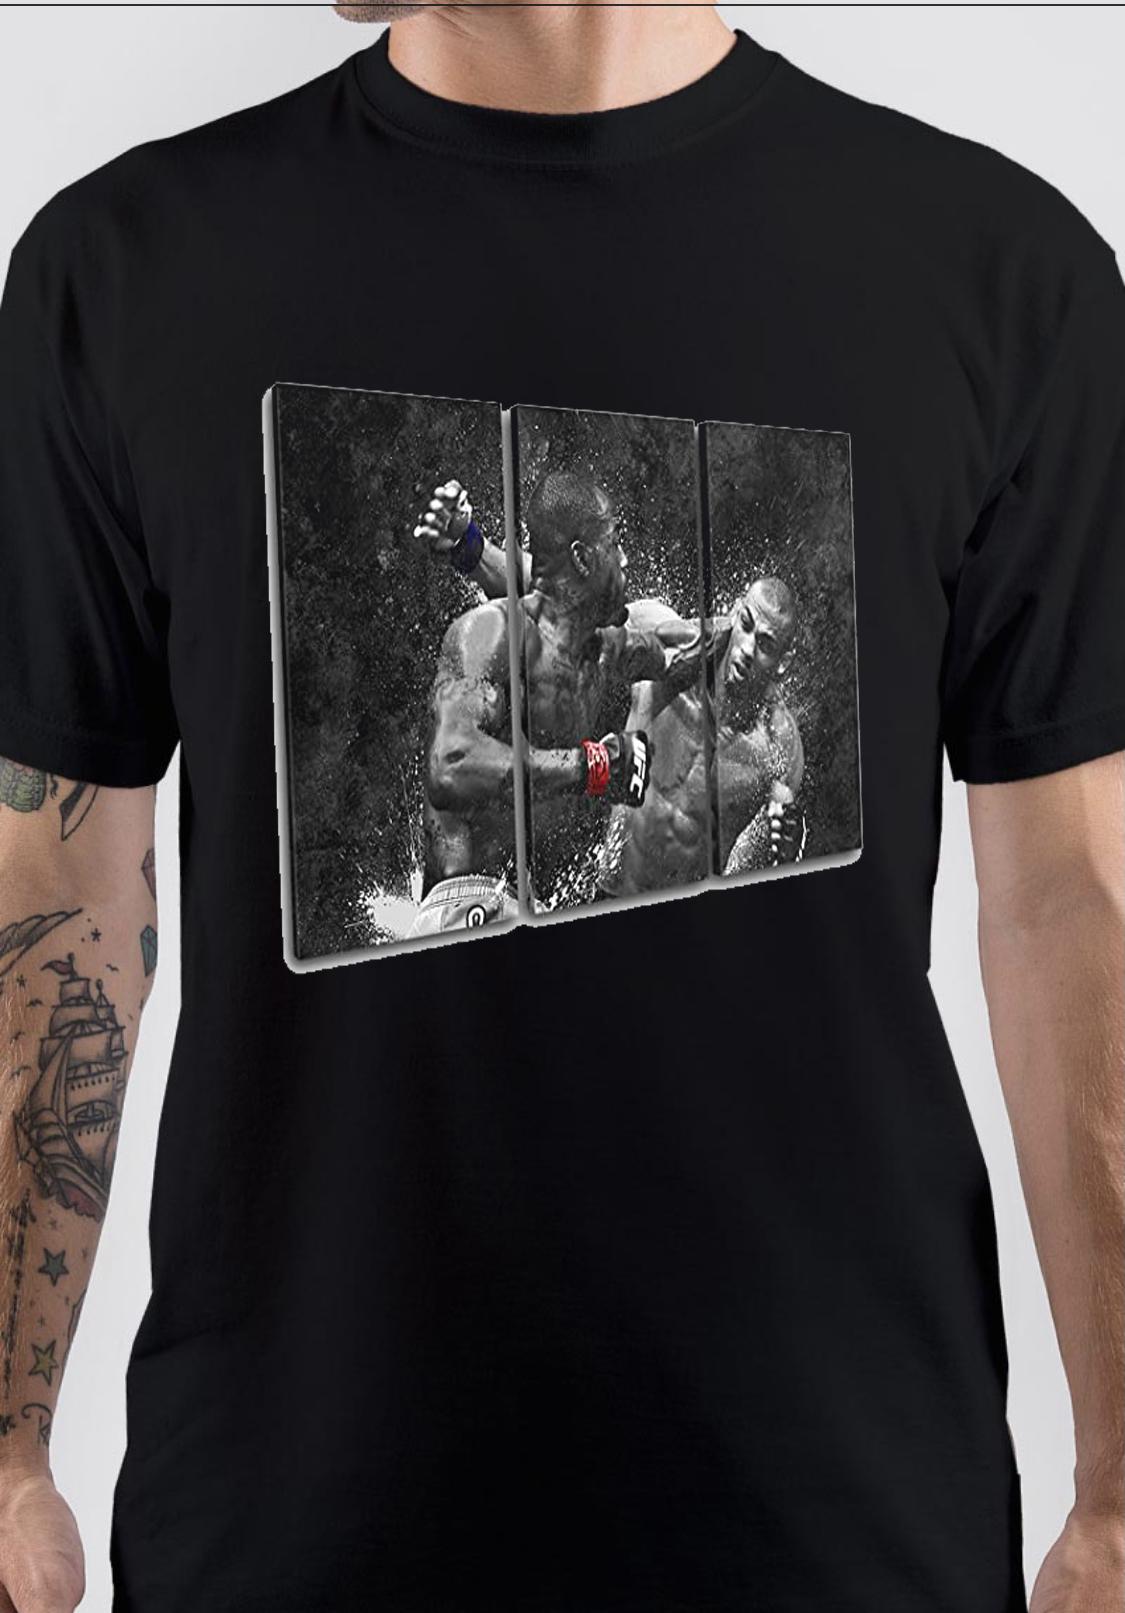 Edson Barboza T-Shirt And Merchandise